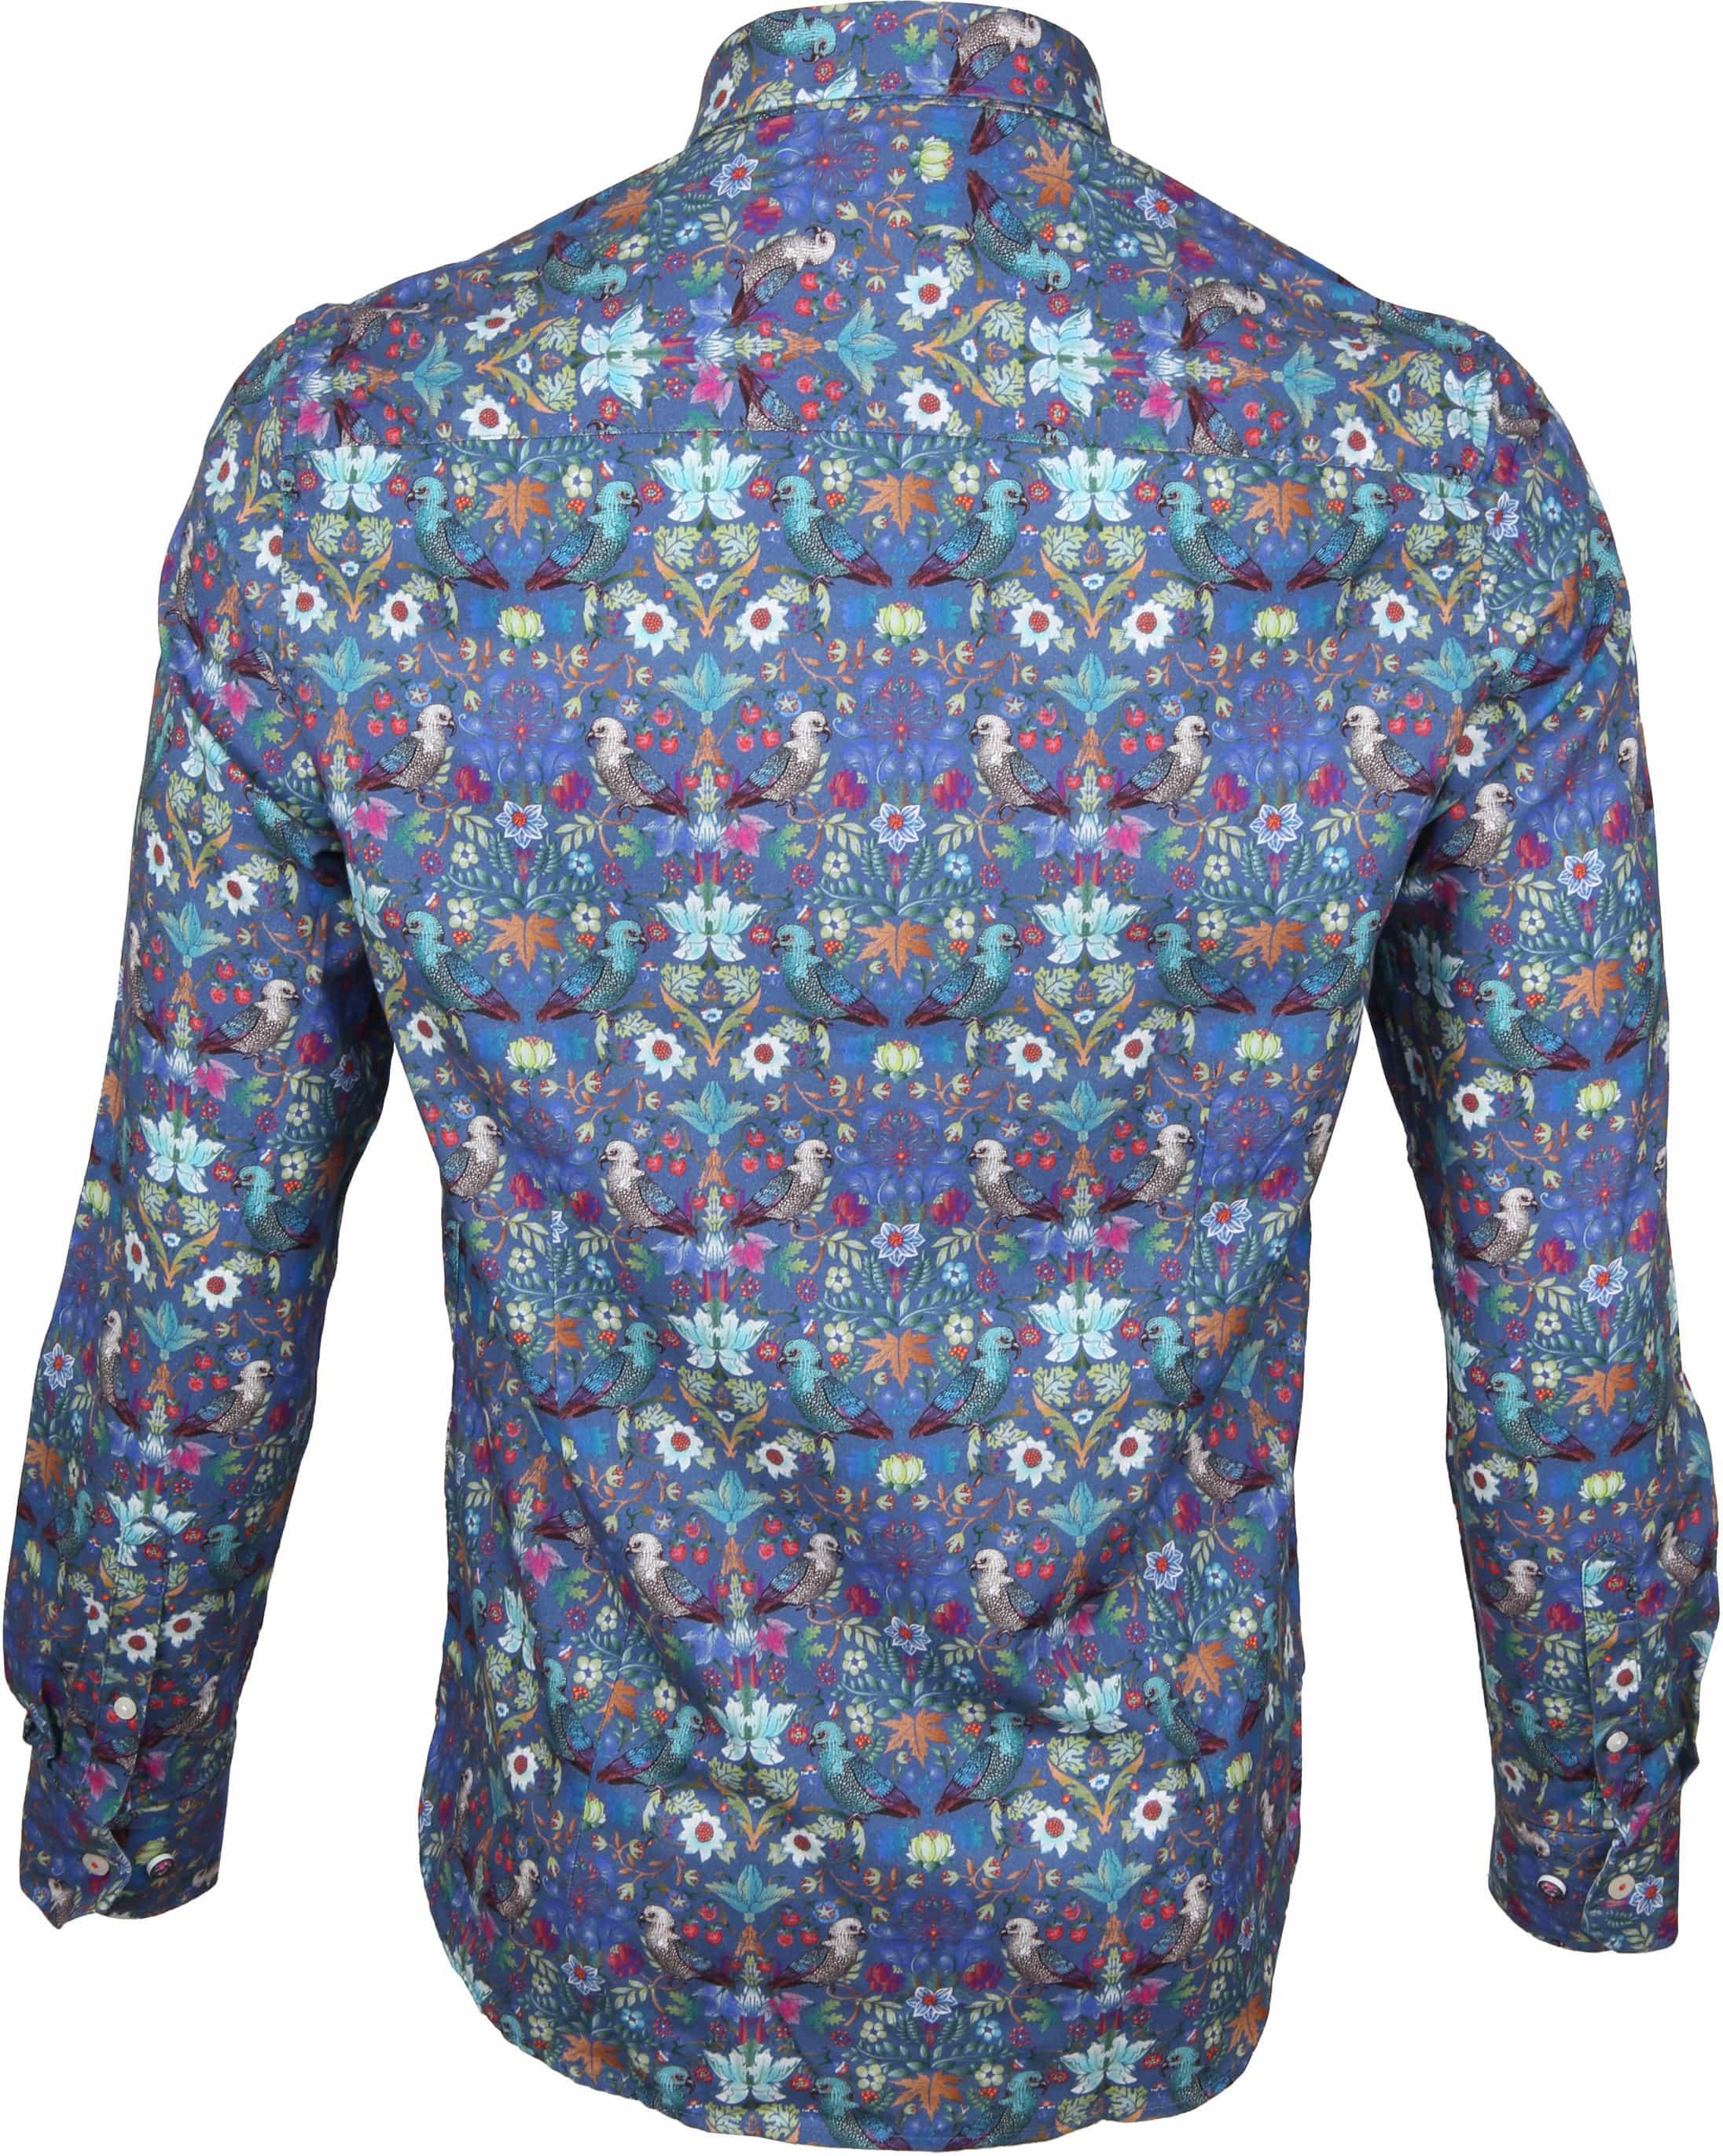 NZA Overhemd Karioi foto 3